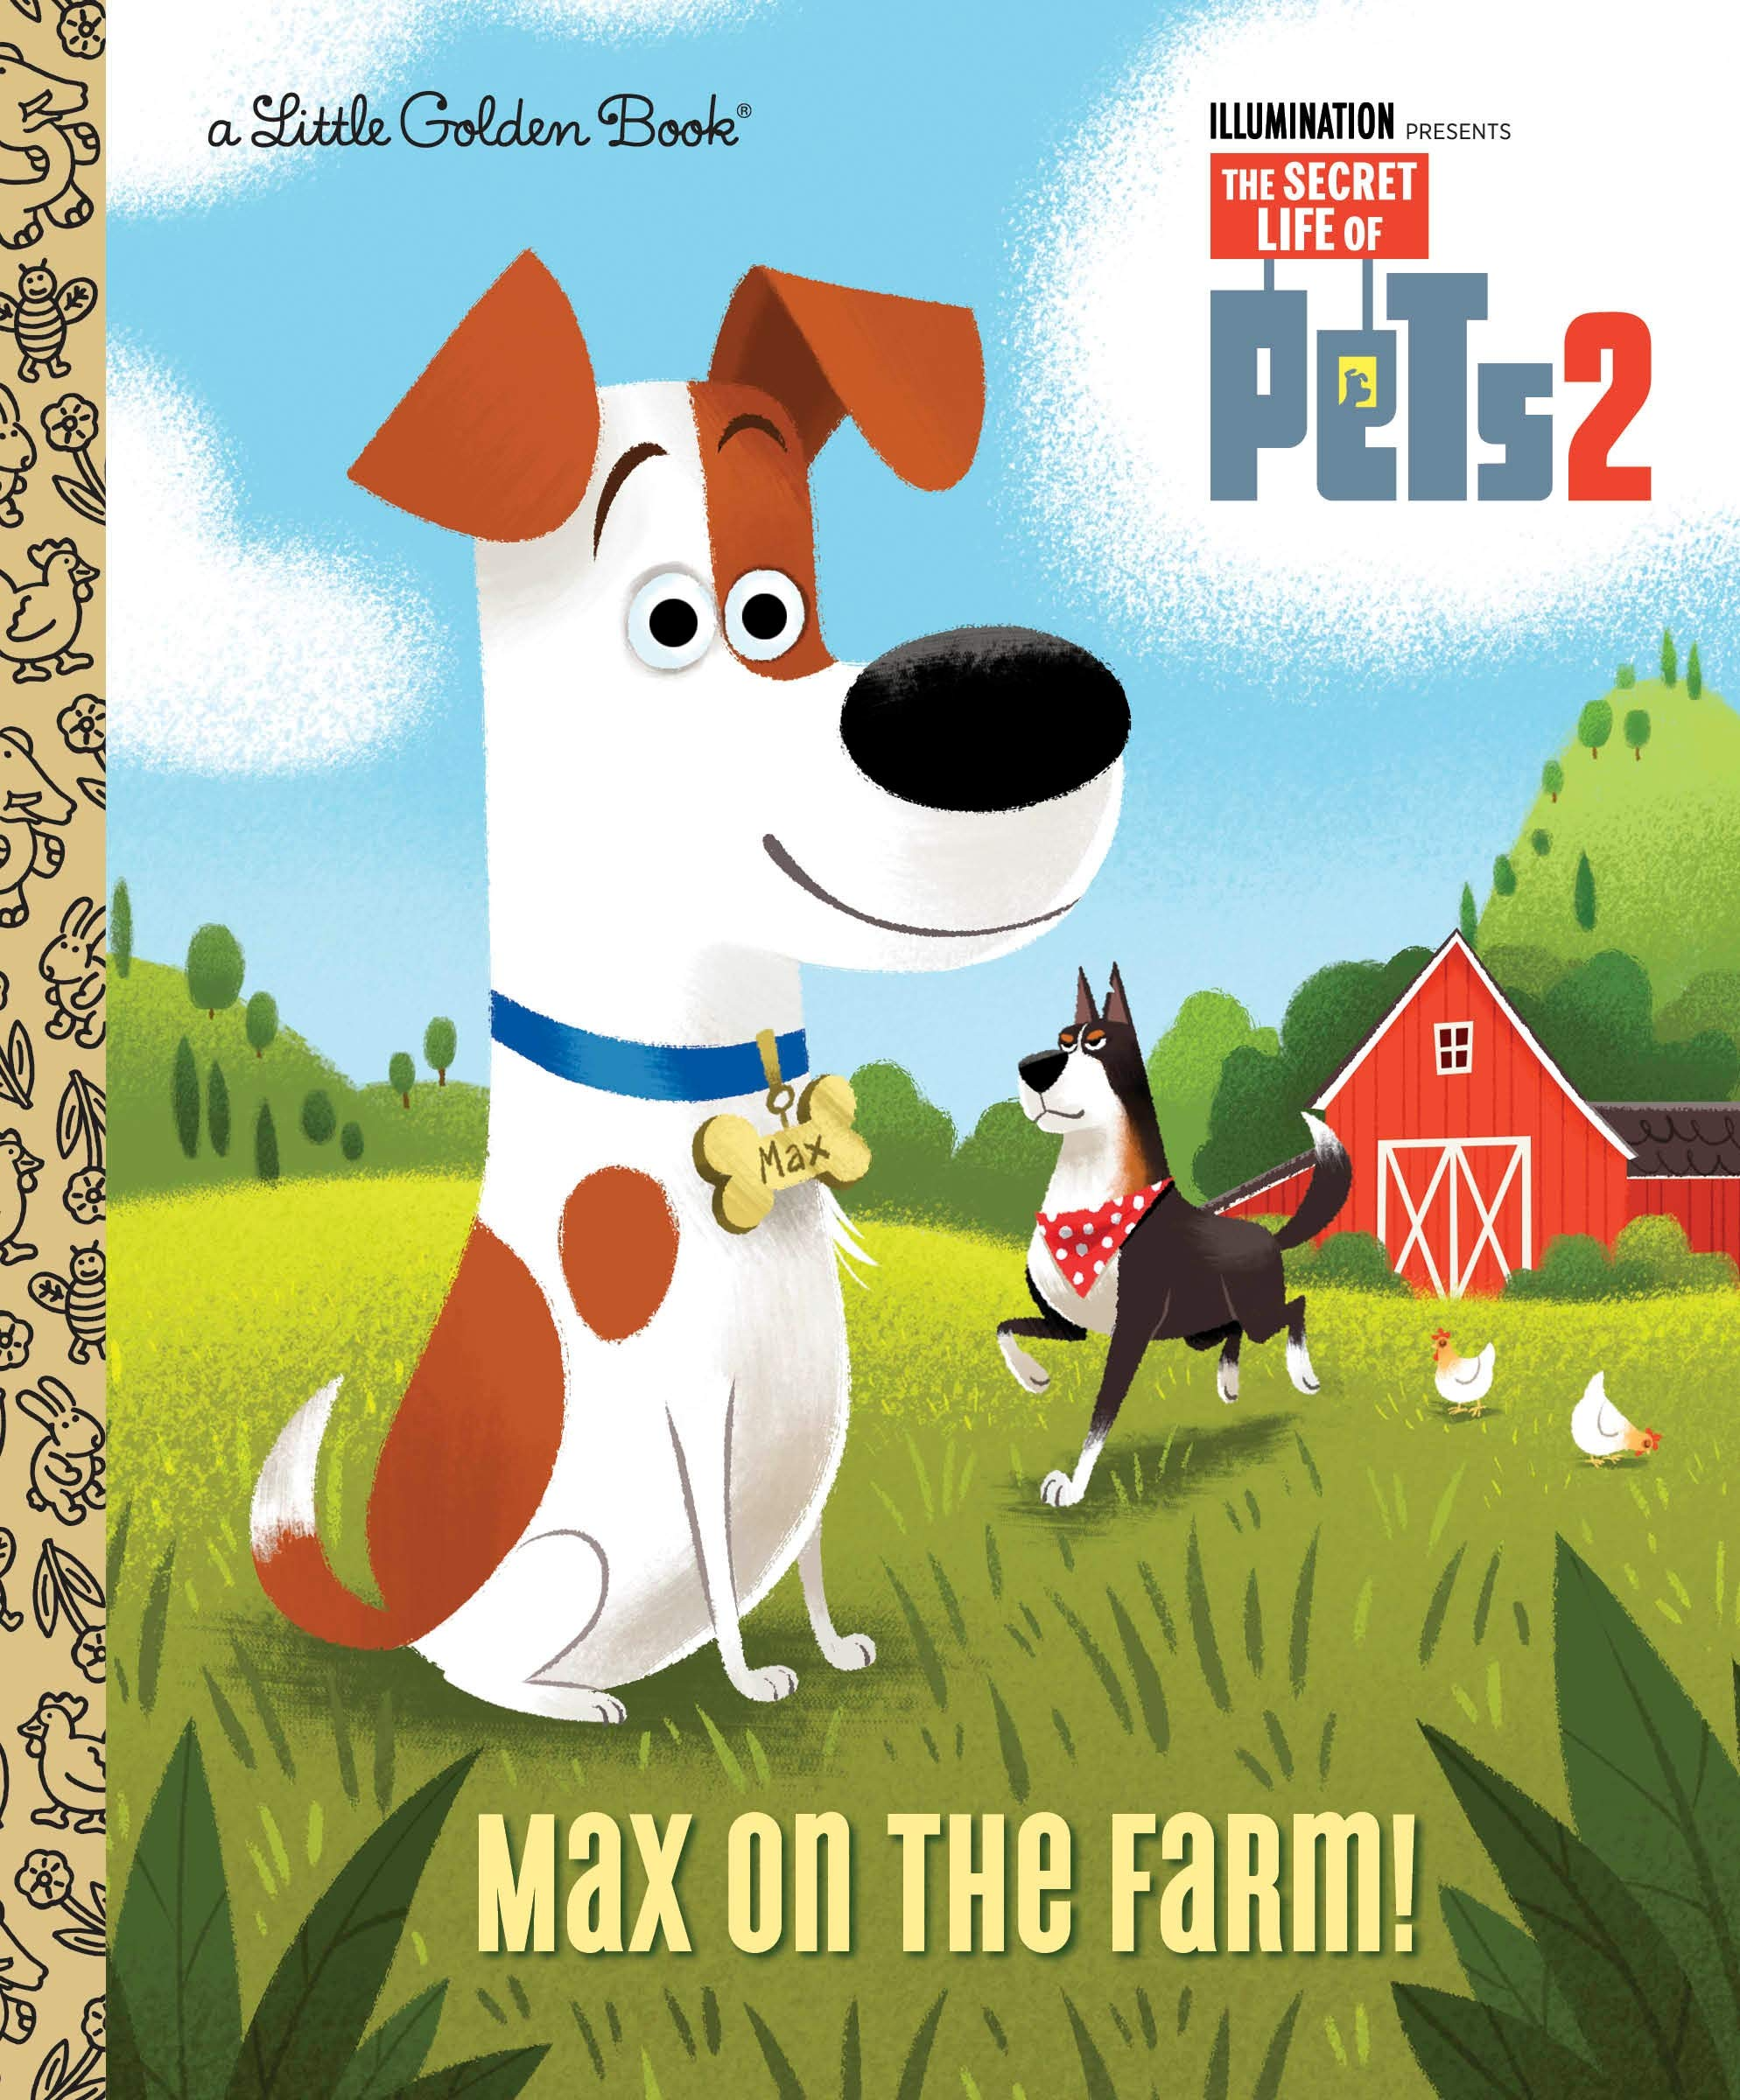 Max On The Farm The Secret Life Of Pets 2 Little Golden Book Lewman David Chang Elsa 9781984849946 Amazon Com Books